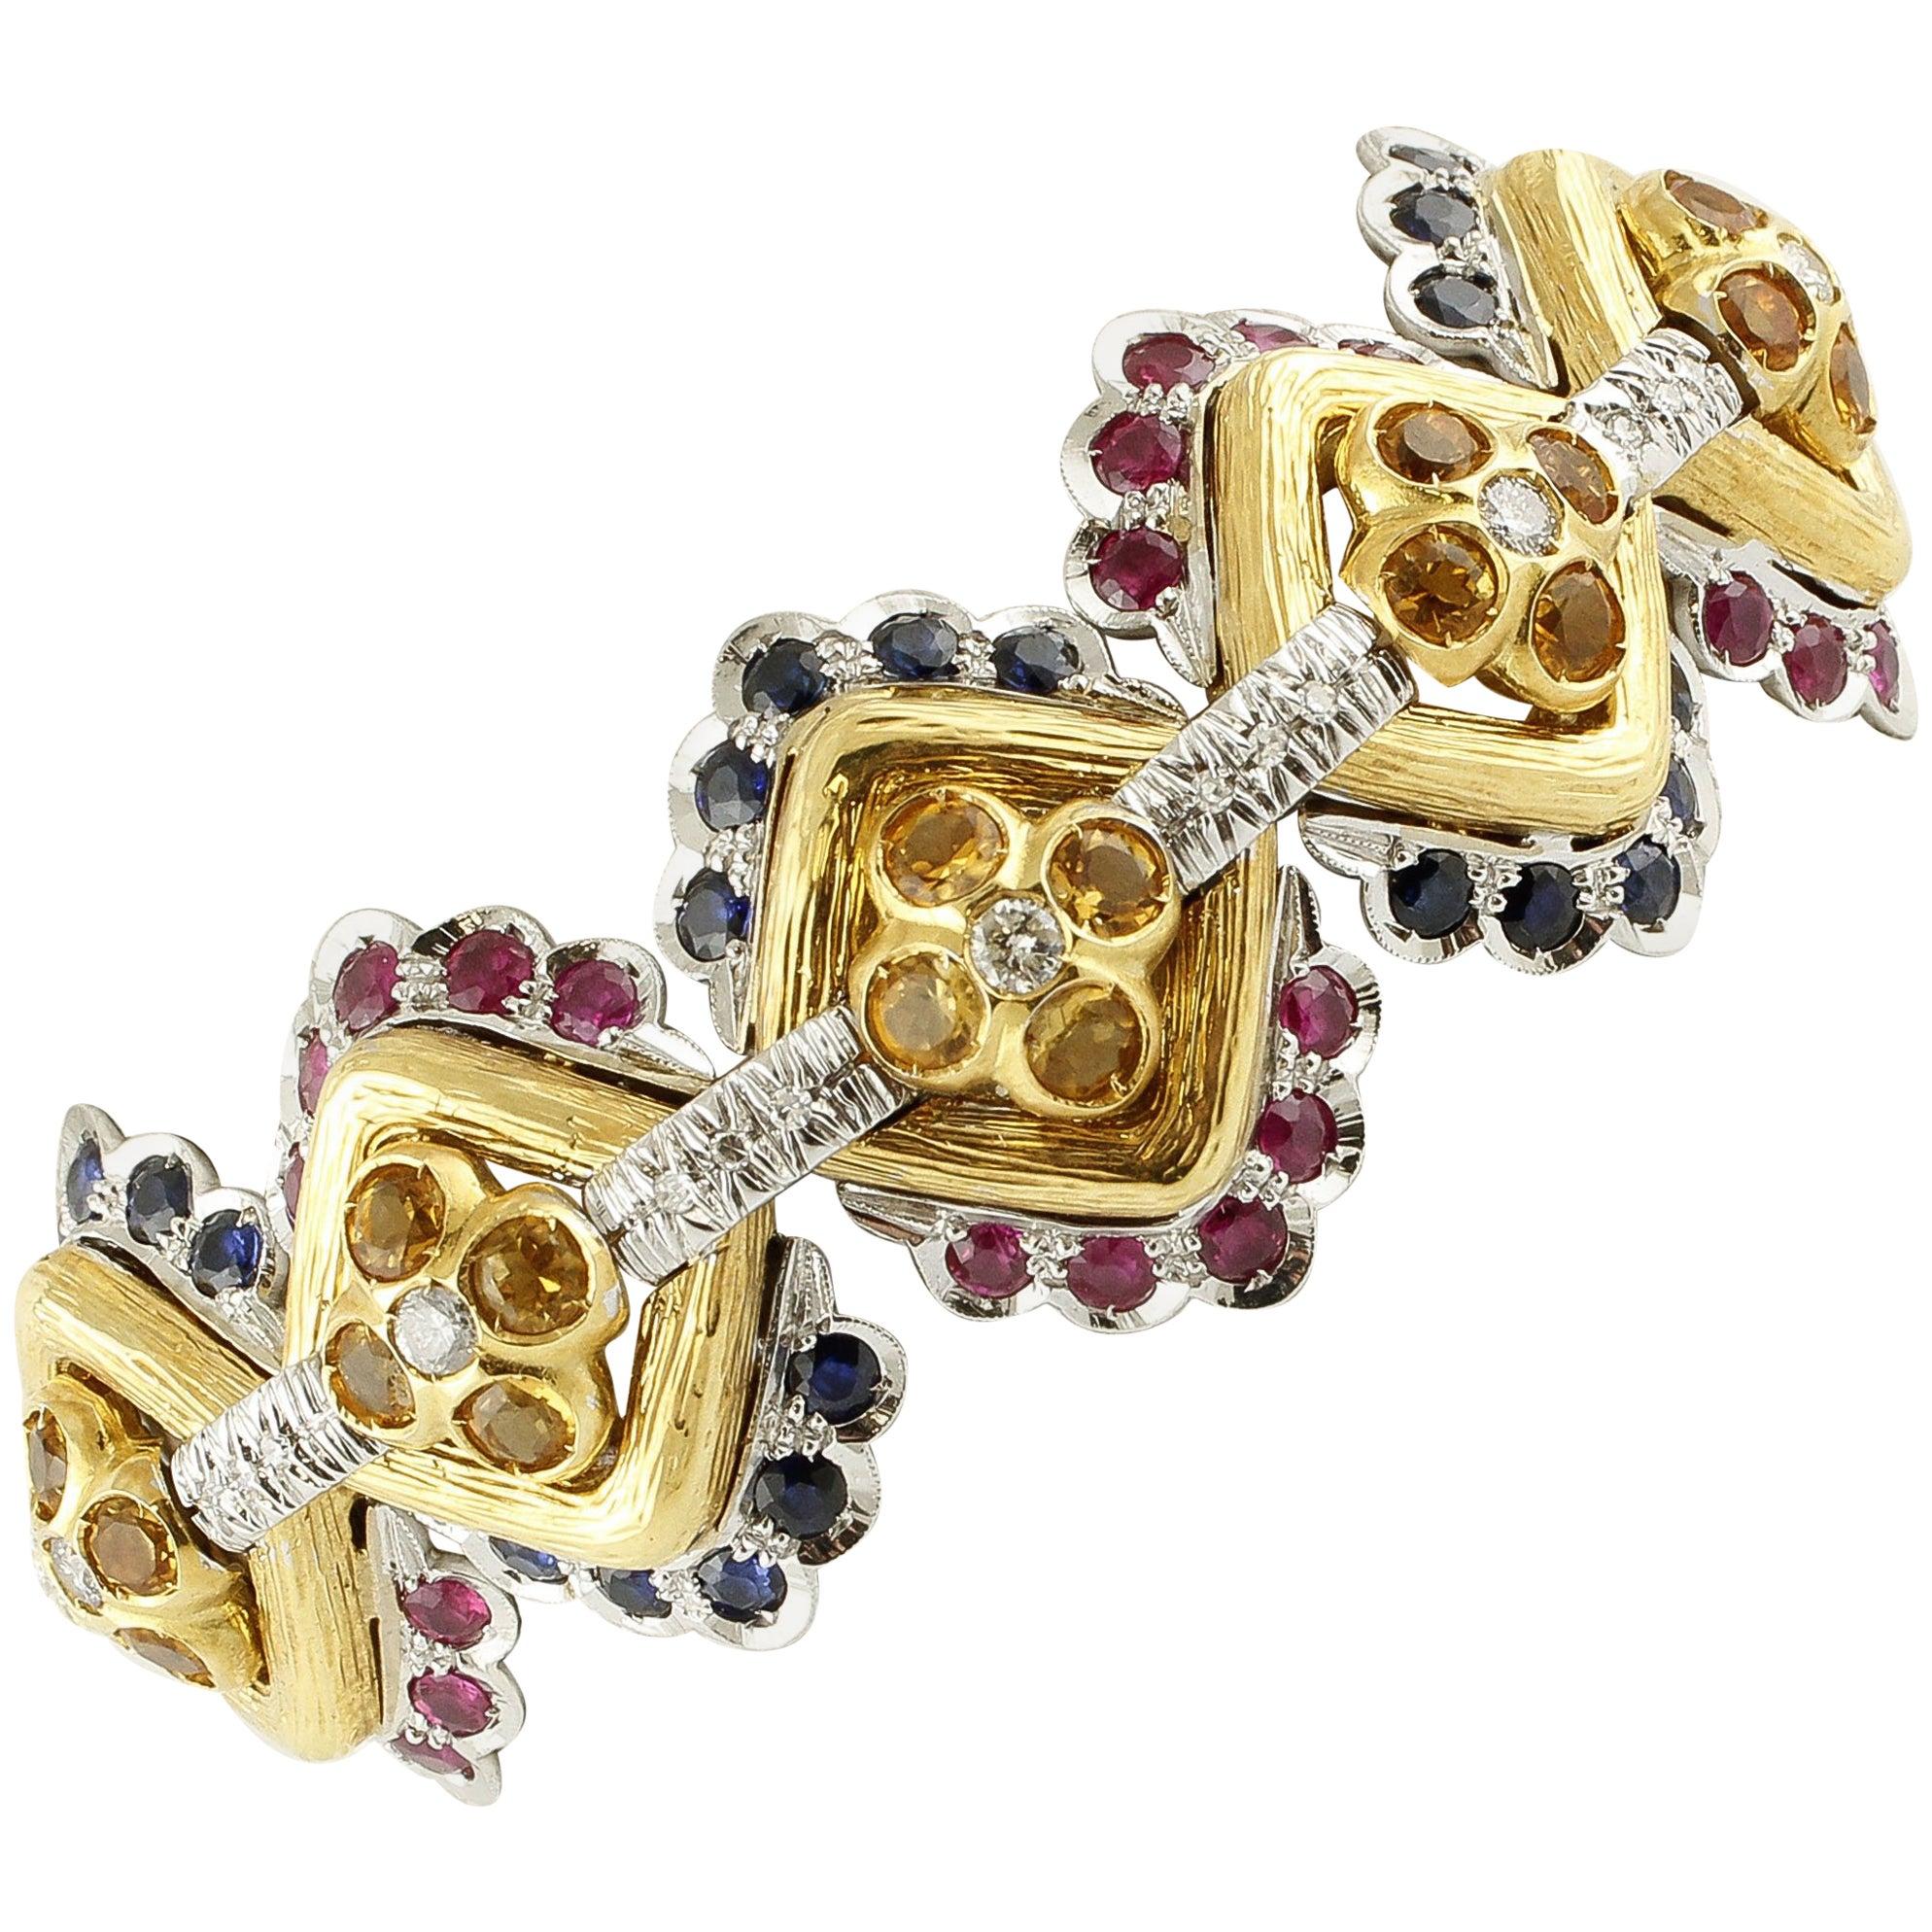 White Diamonds, Blue Sapphires, Rubies White and Yellow Gold Link Bracelet